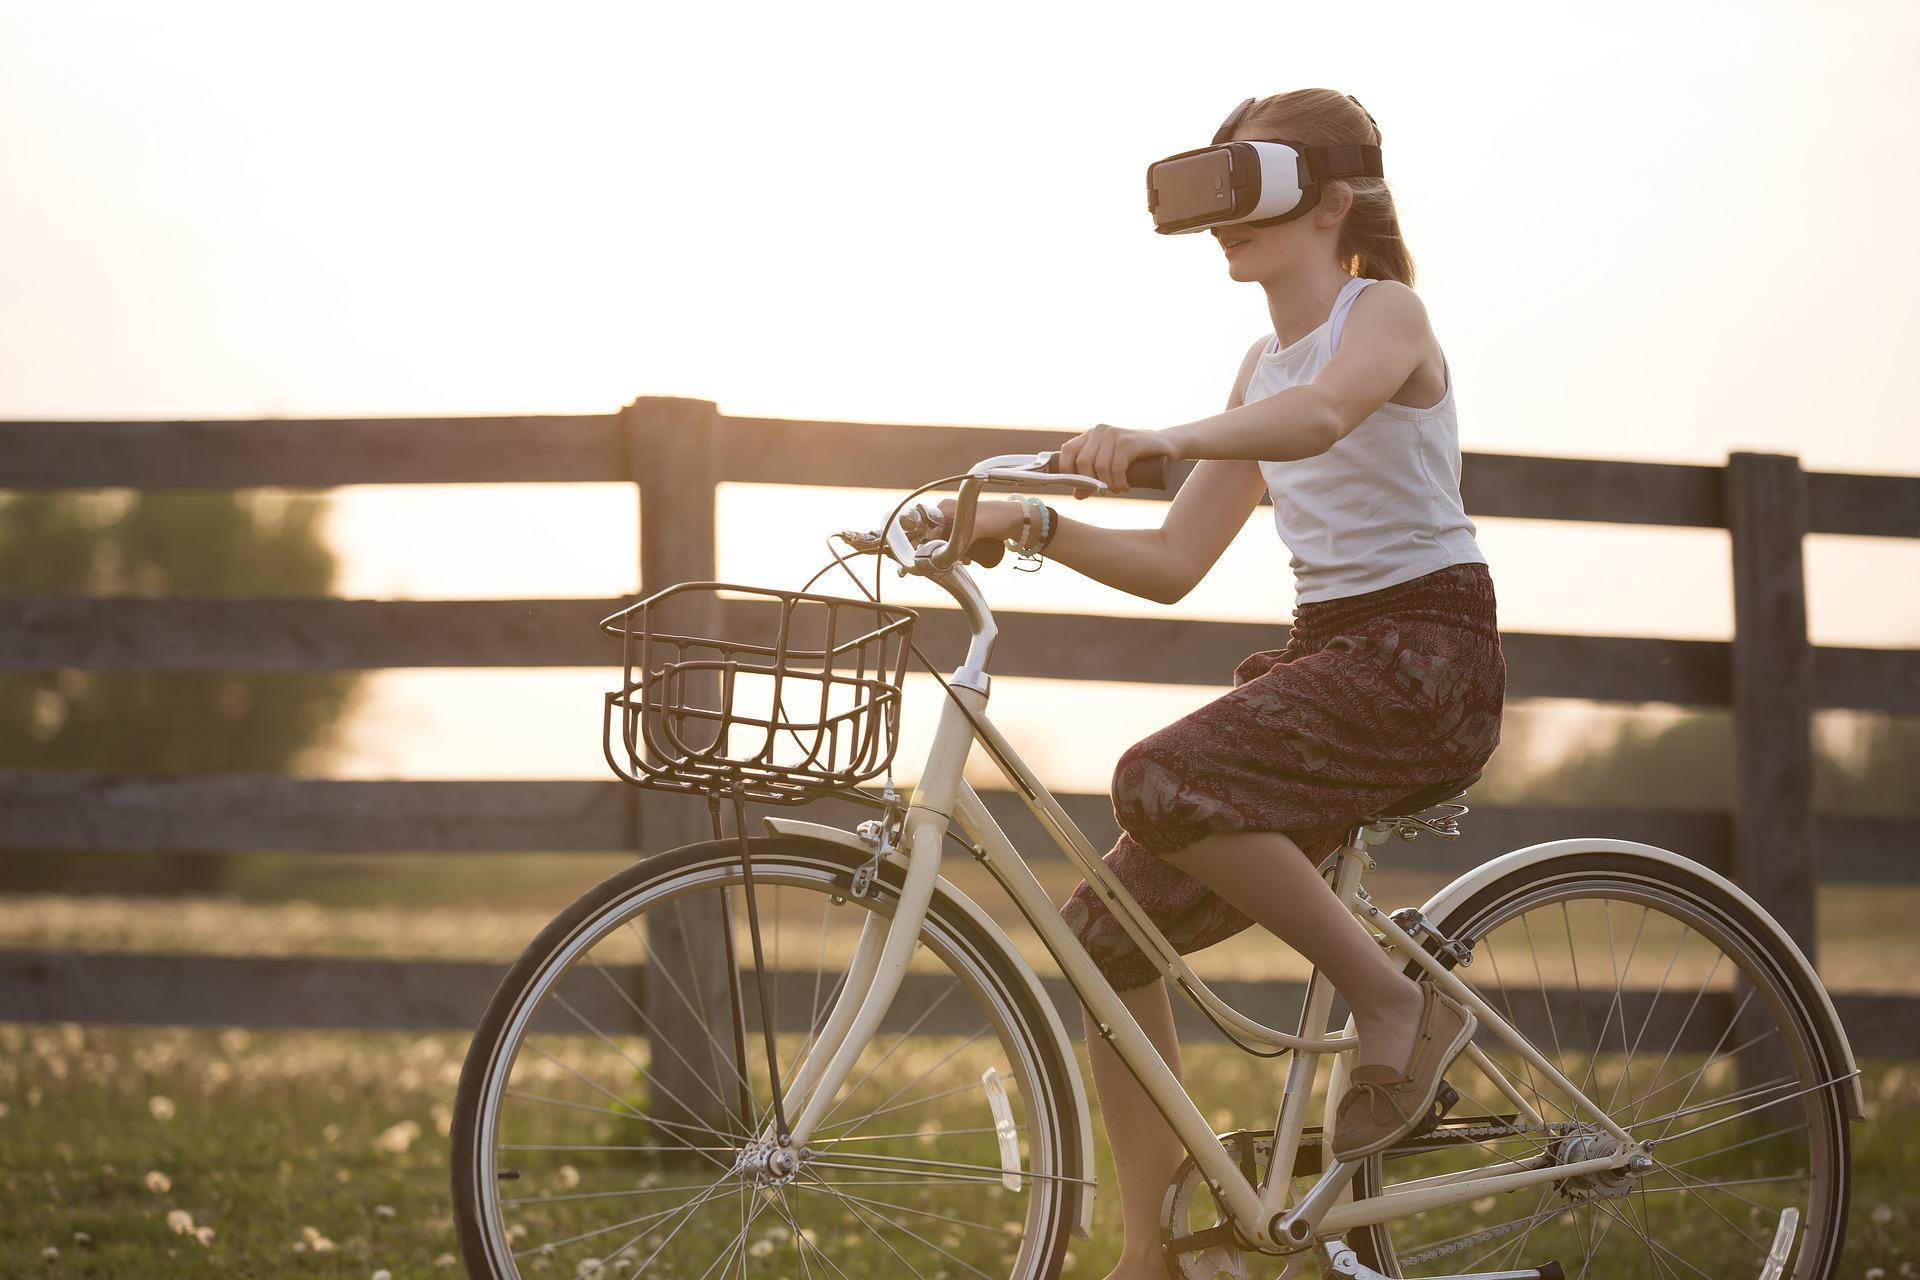 augmented-reality-1853592_1920jpg